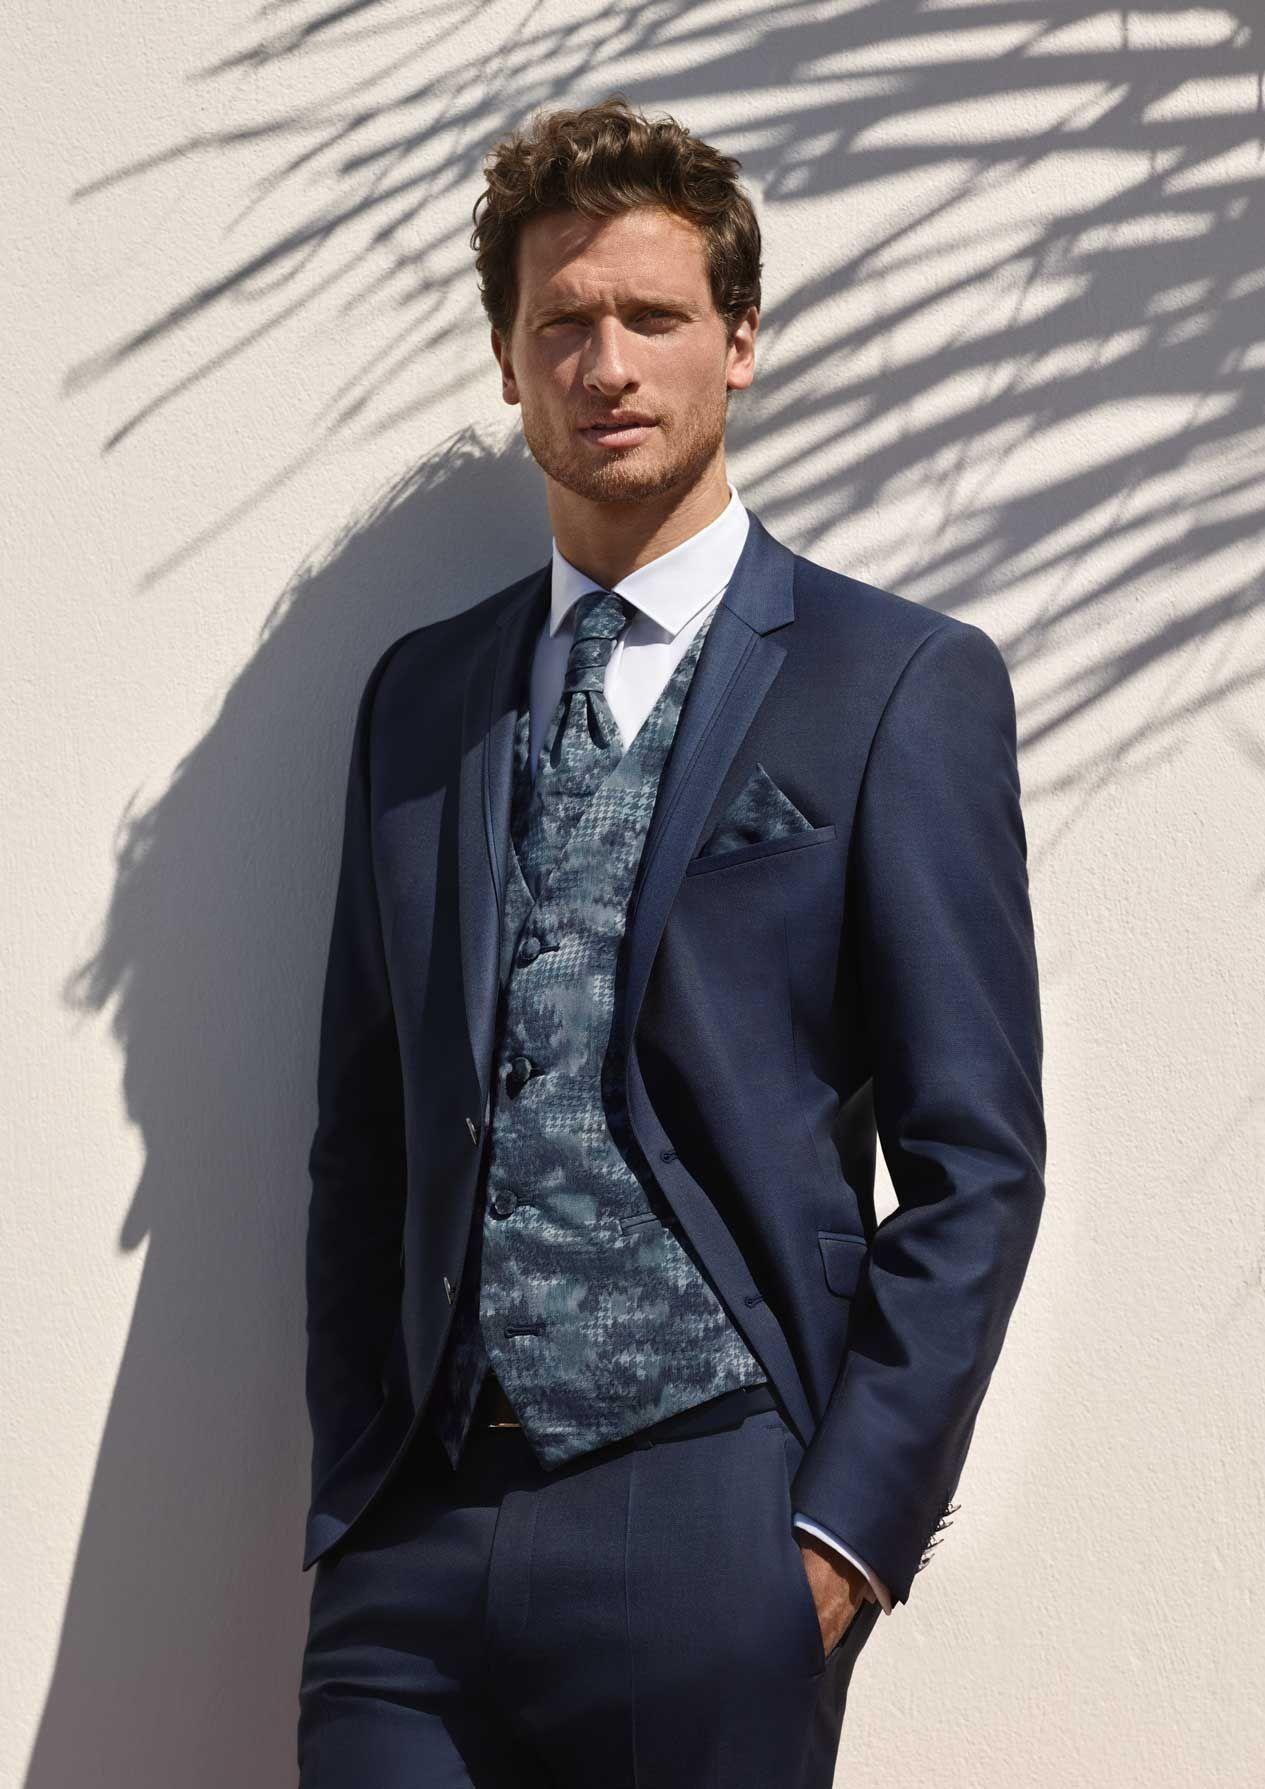 Herrenmode Digel | Digel anzug, Herren mode und Bräutigam mode